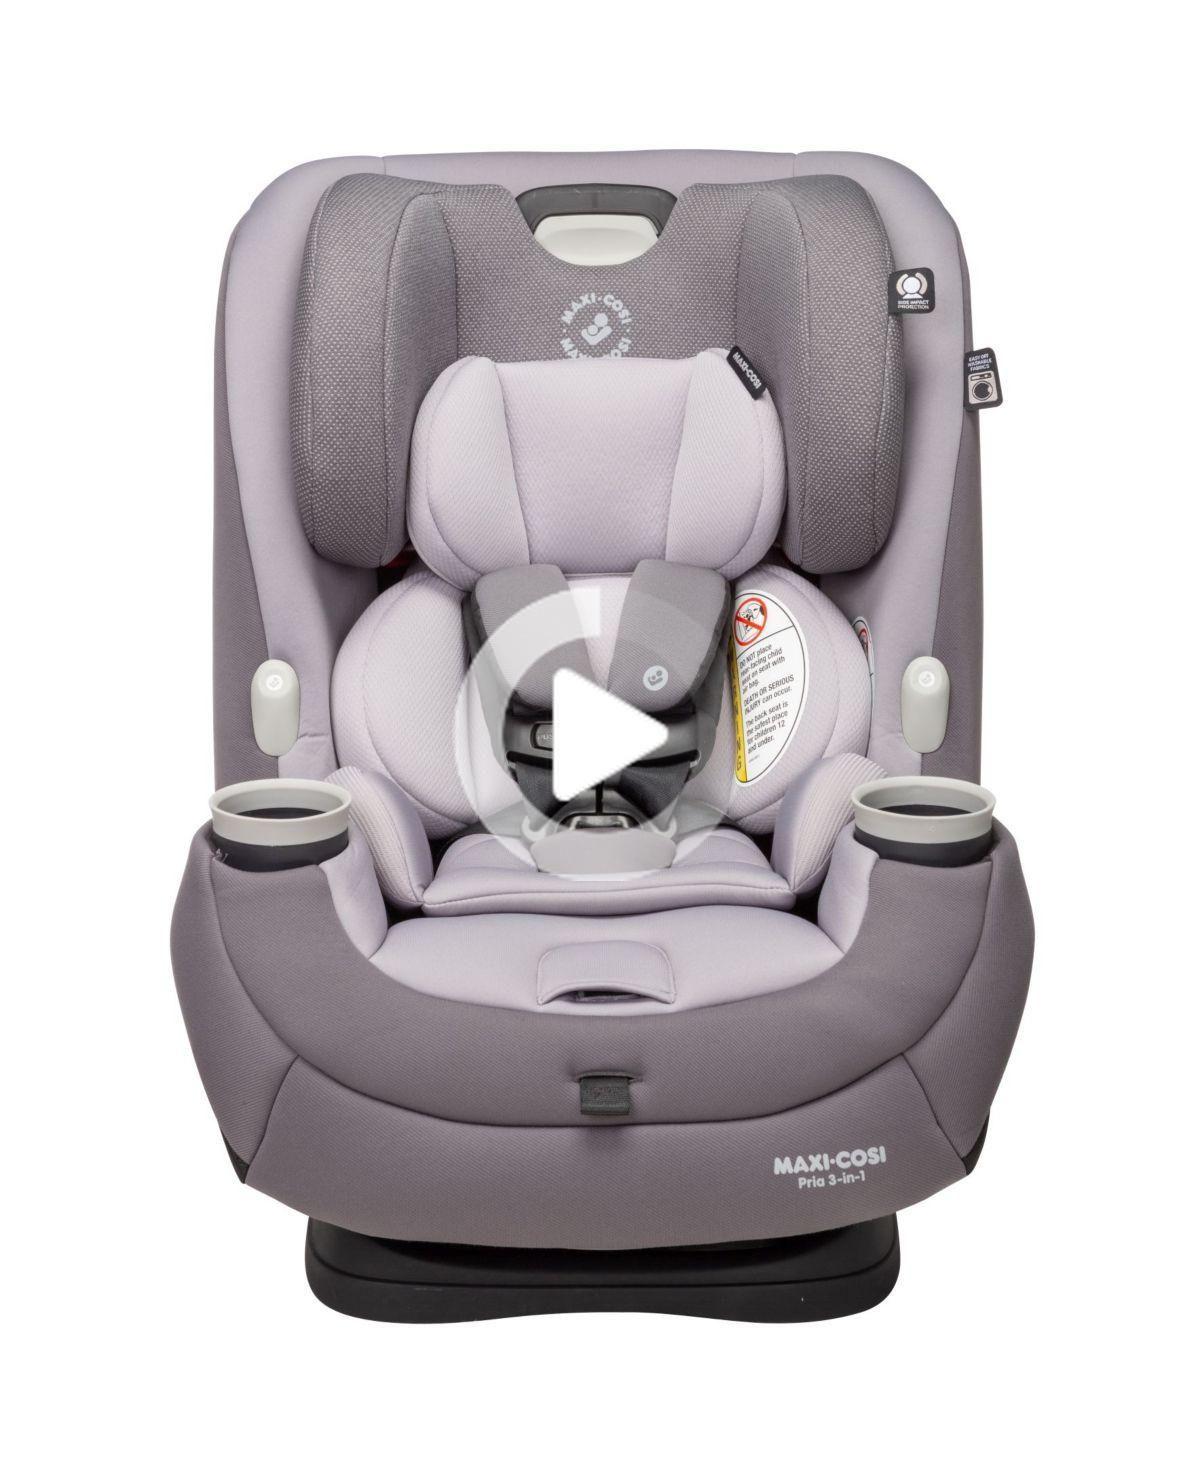 Maxi cosi maxicosi pria 3in1 car seat reviews all